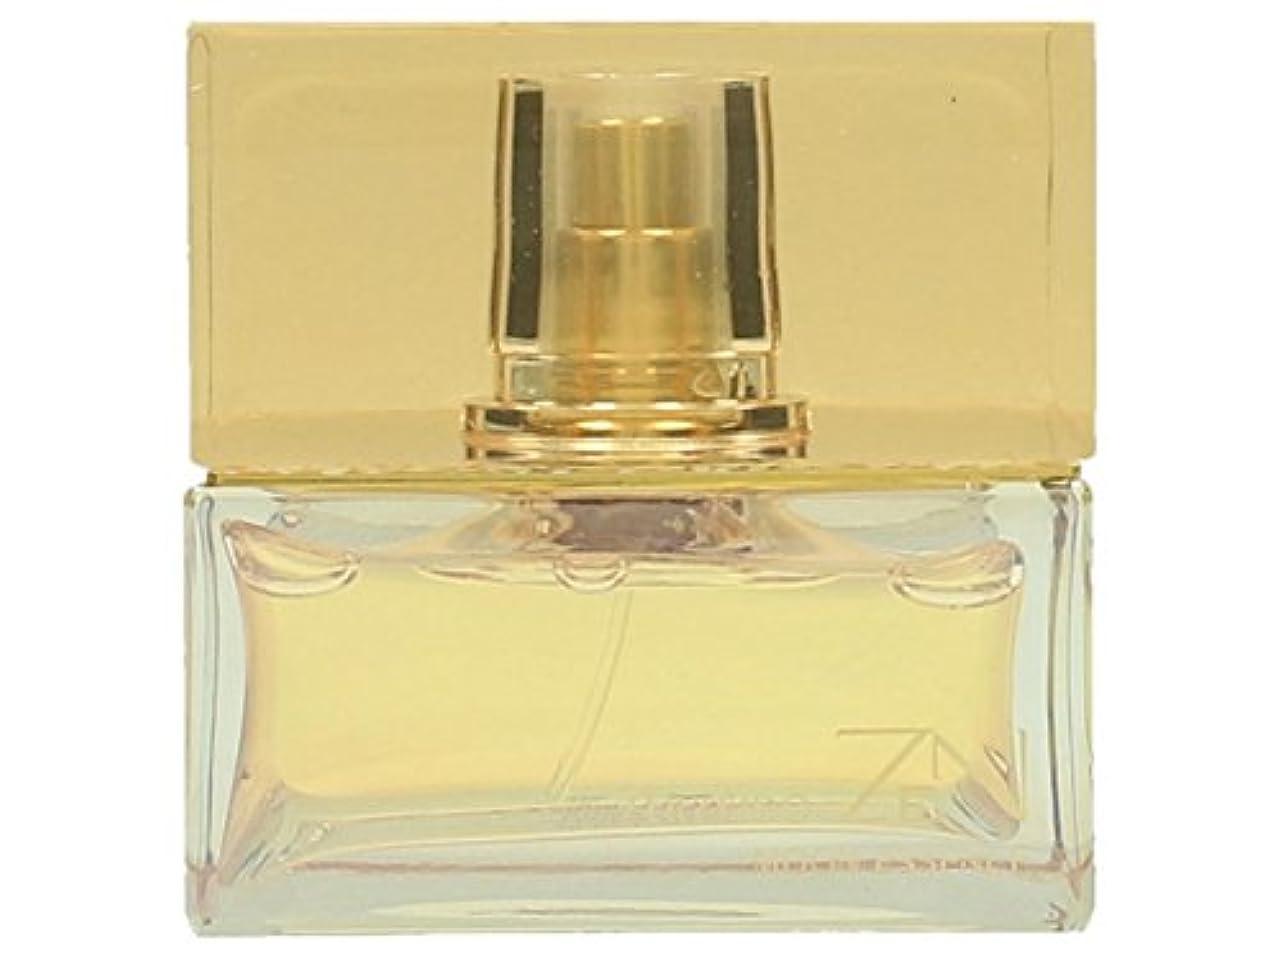 サポート最少森資生堂 Zen Moon Essence Eau De Parfum Intense Spray 50ml/1.6oz並行輸入品